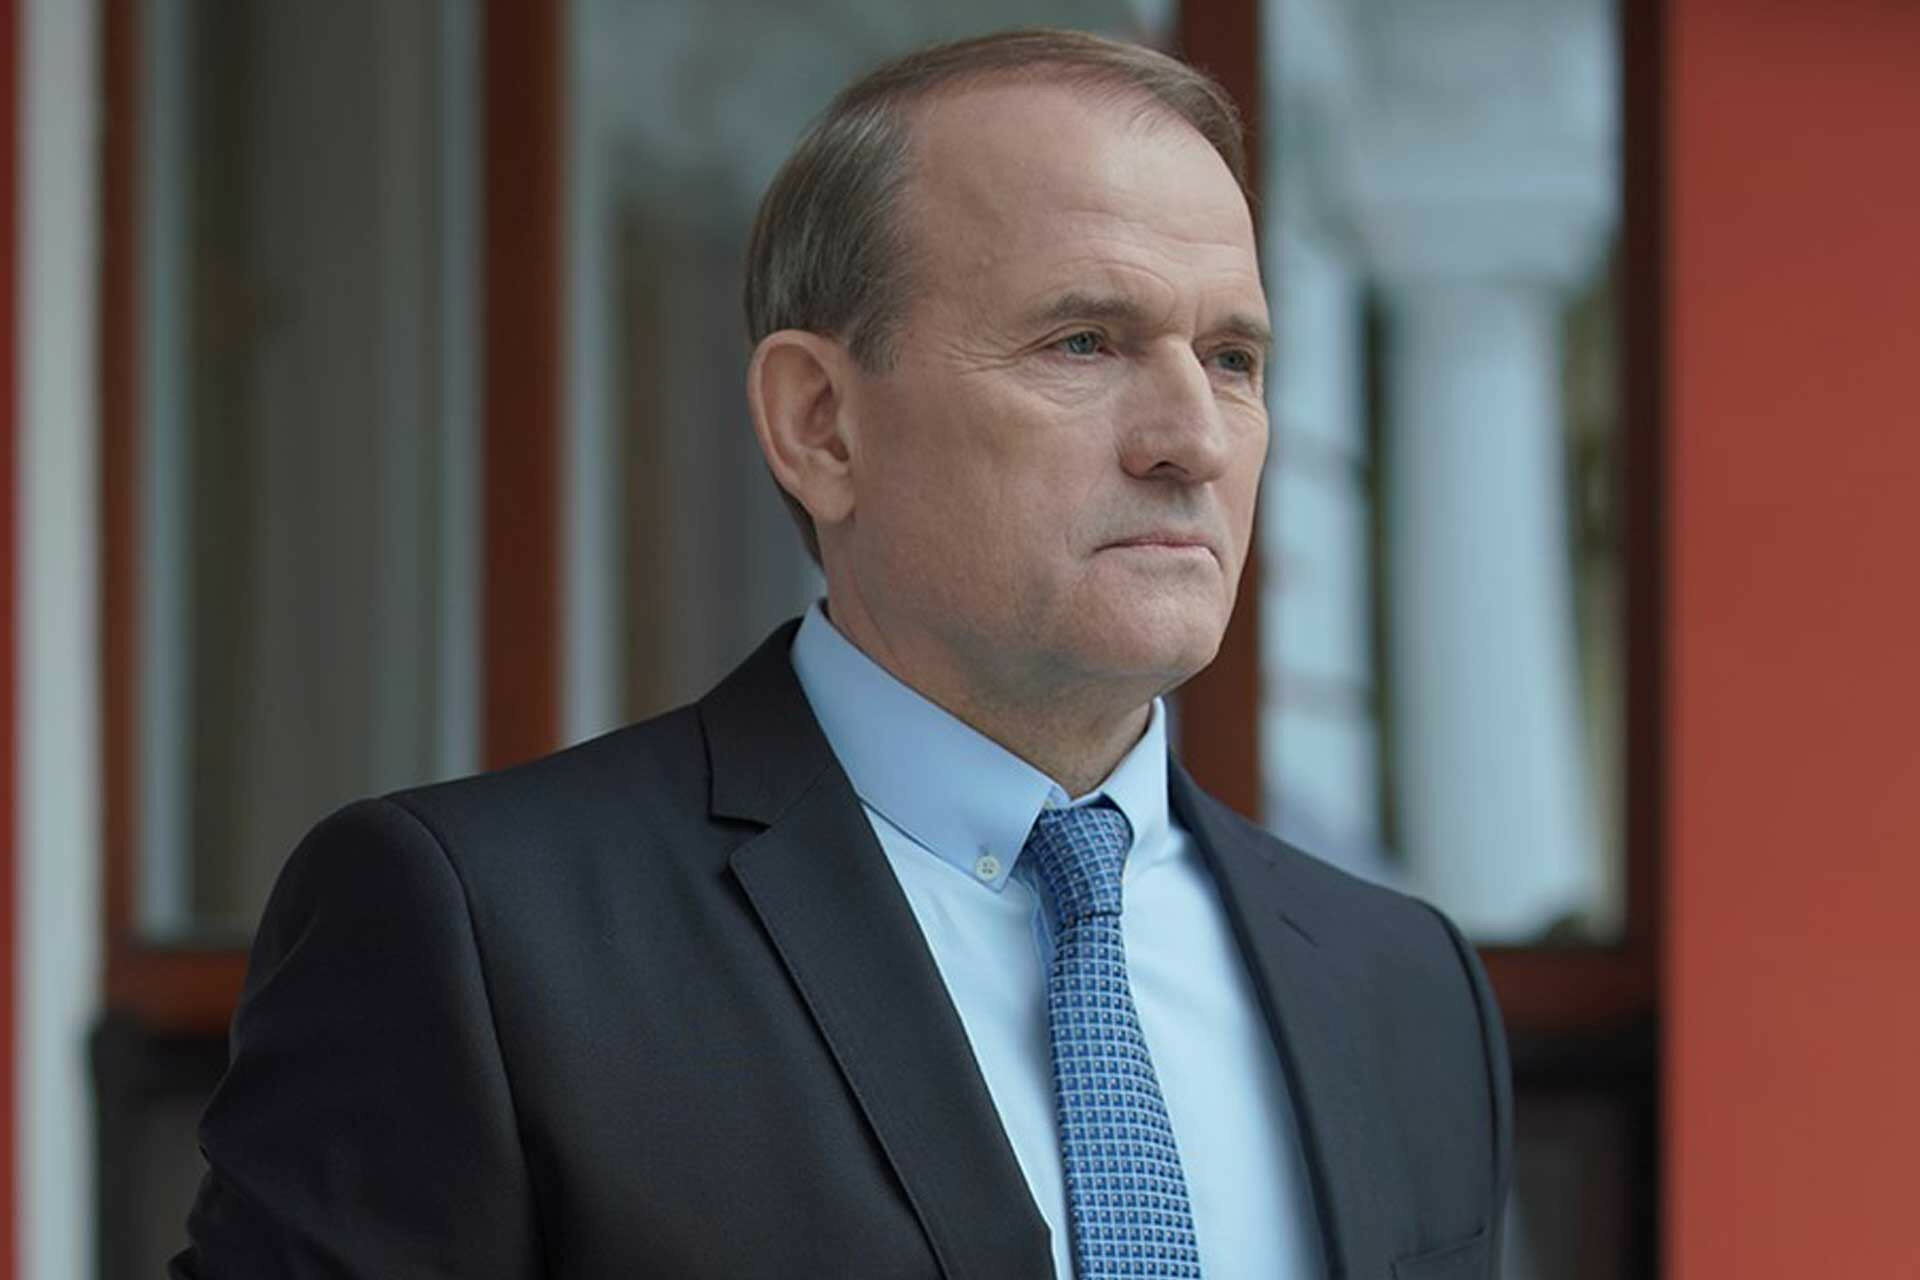 Суд над Медведчуком: решение объявят в пятницу